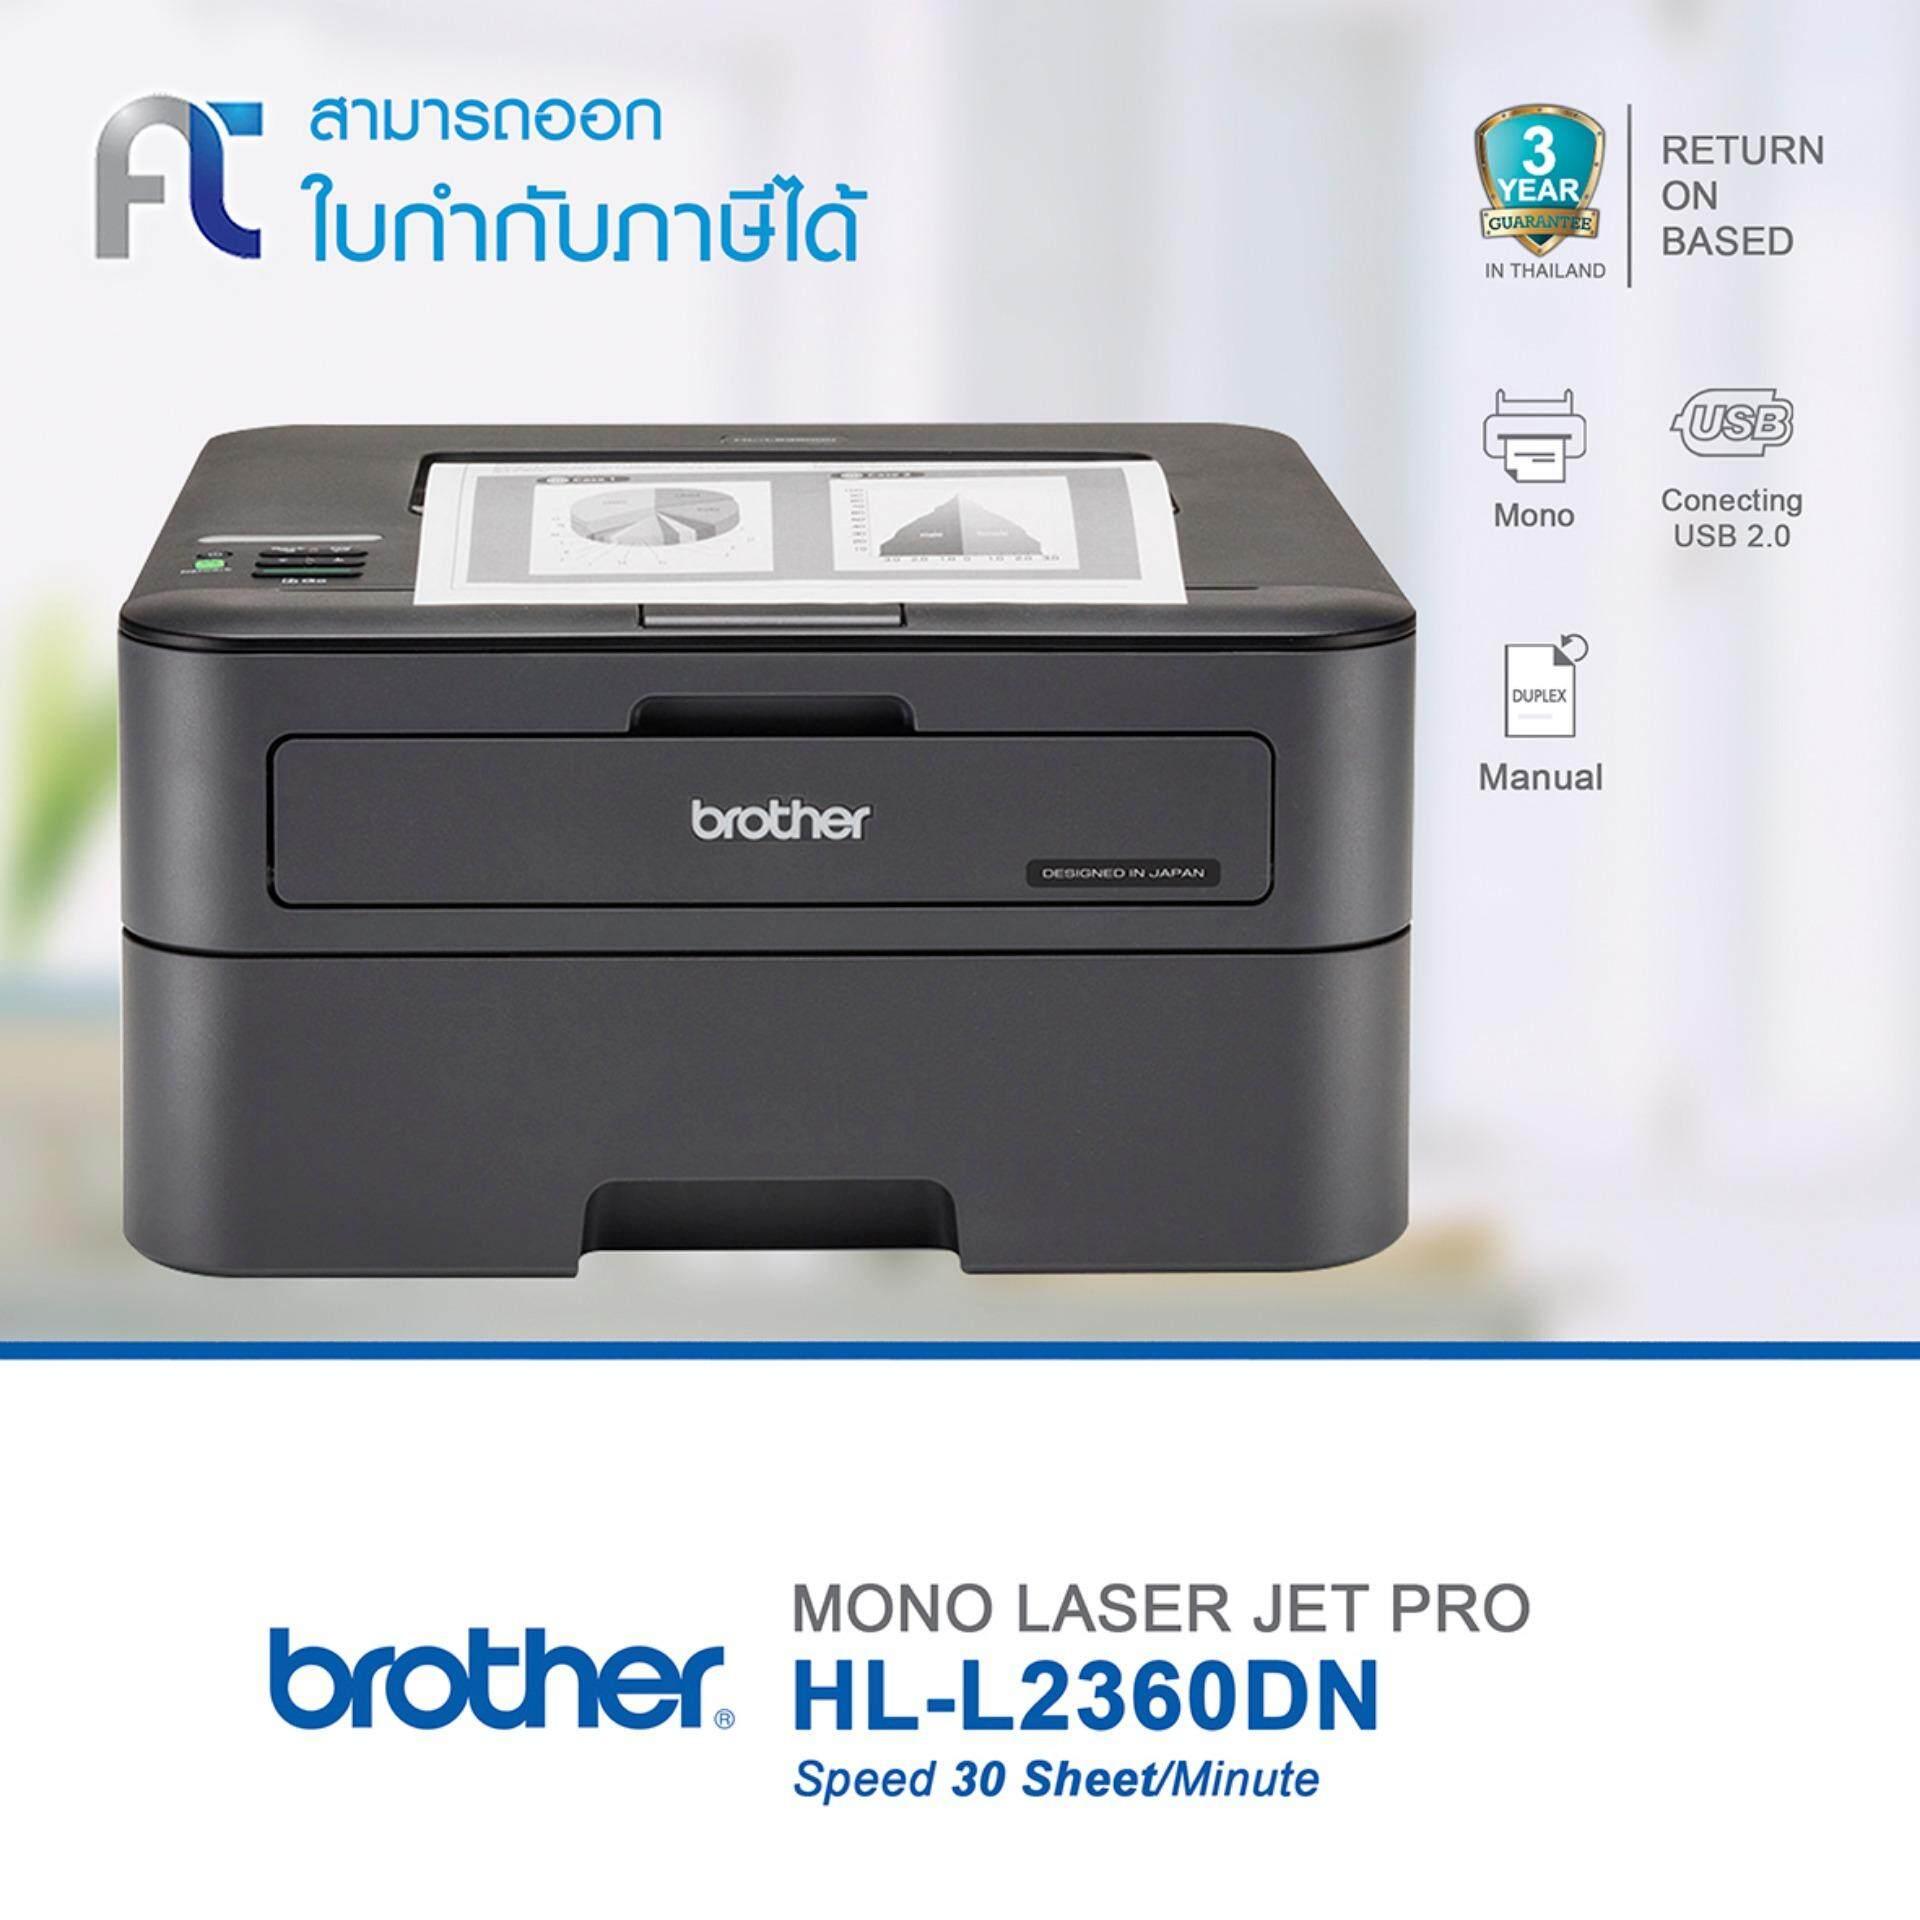 3 Year Warranty Brother Hl L2360Dn เครื่องพิมพ์เลเซอร์ขาว ดำ การพิมพ์เอกสารแบบสองด้าน อัตโนมัติ Duplex 2 Sided Print การเชื่อมต่อ Usb 2 Hi Speed ใน กรุงเทพมหานคร